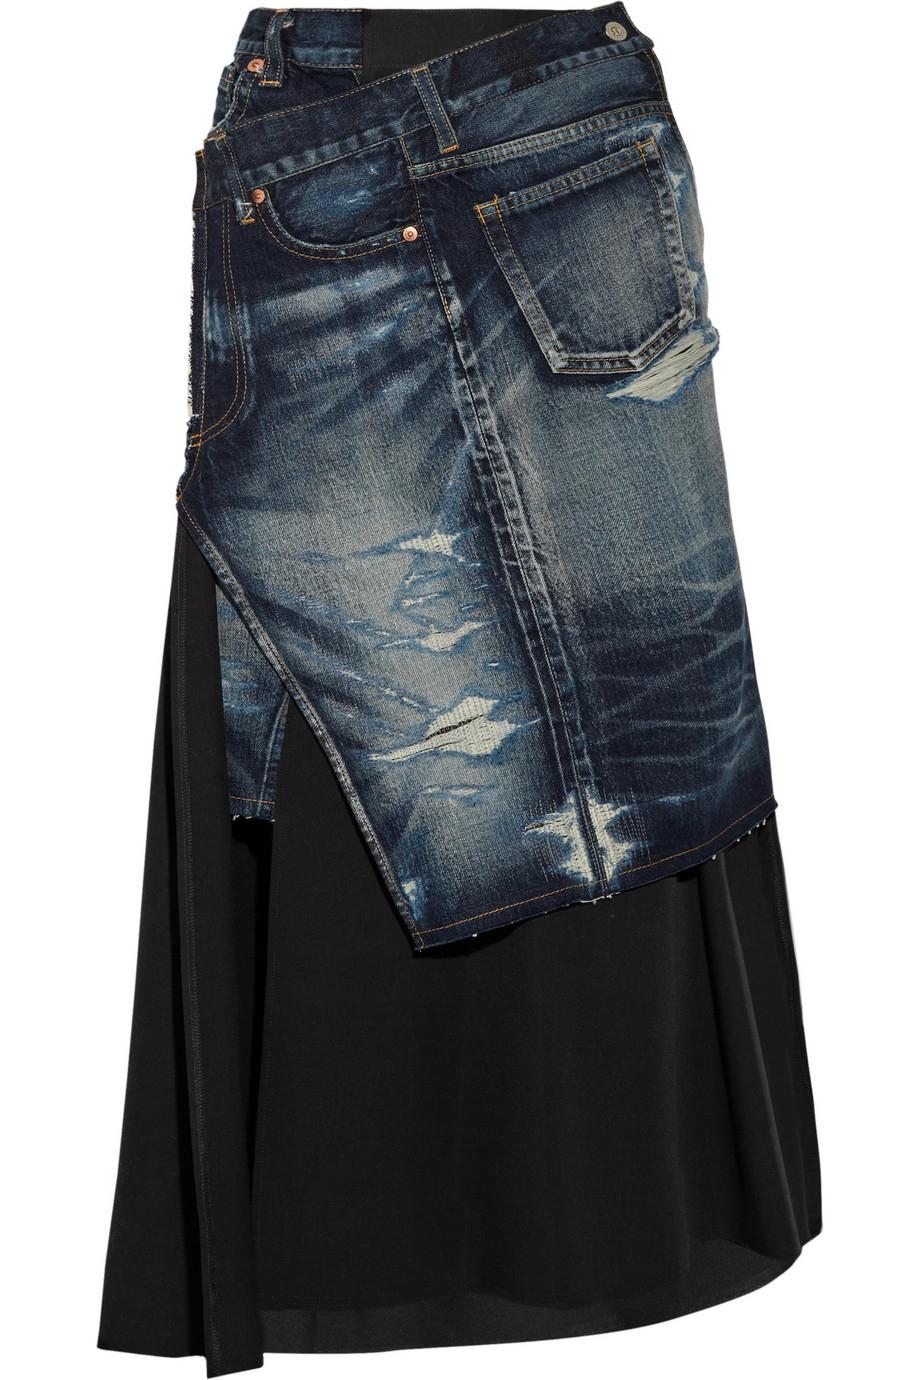 junya watanabe asymmetric wool twill and denim midi skirt